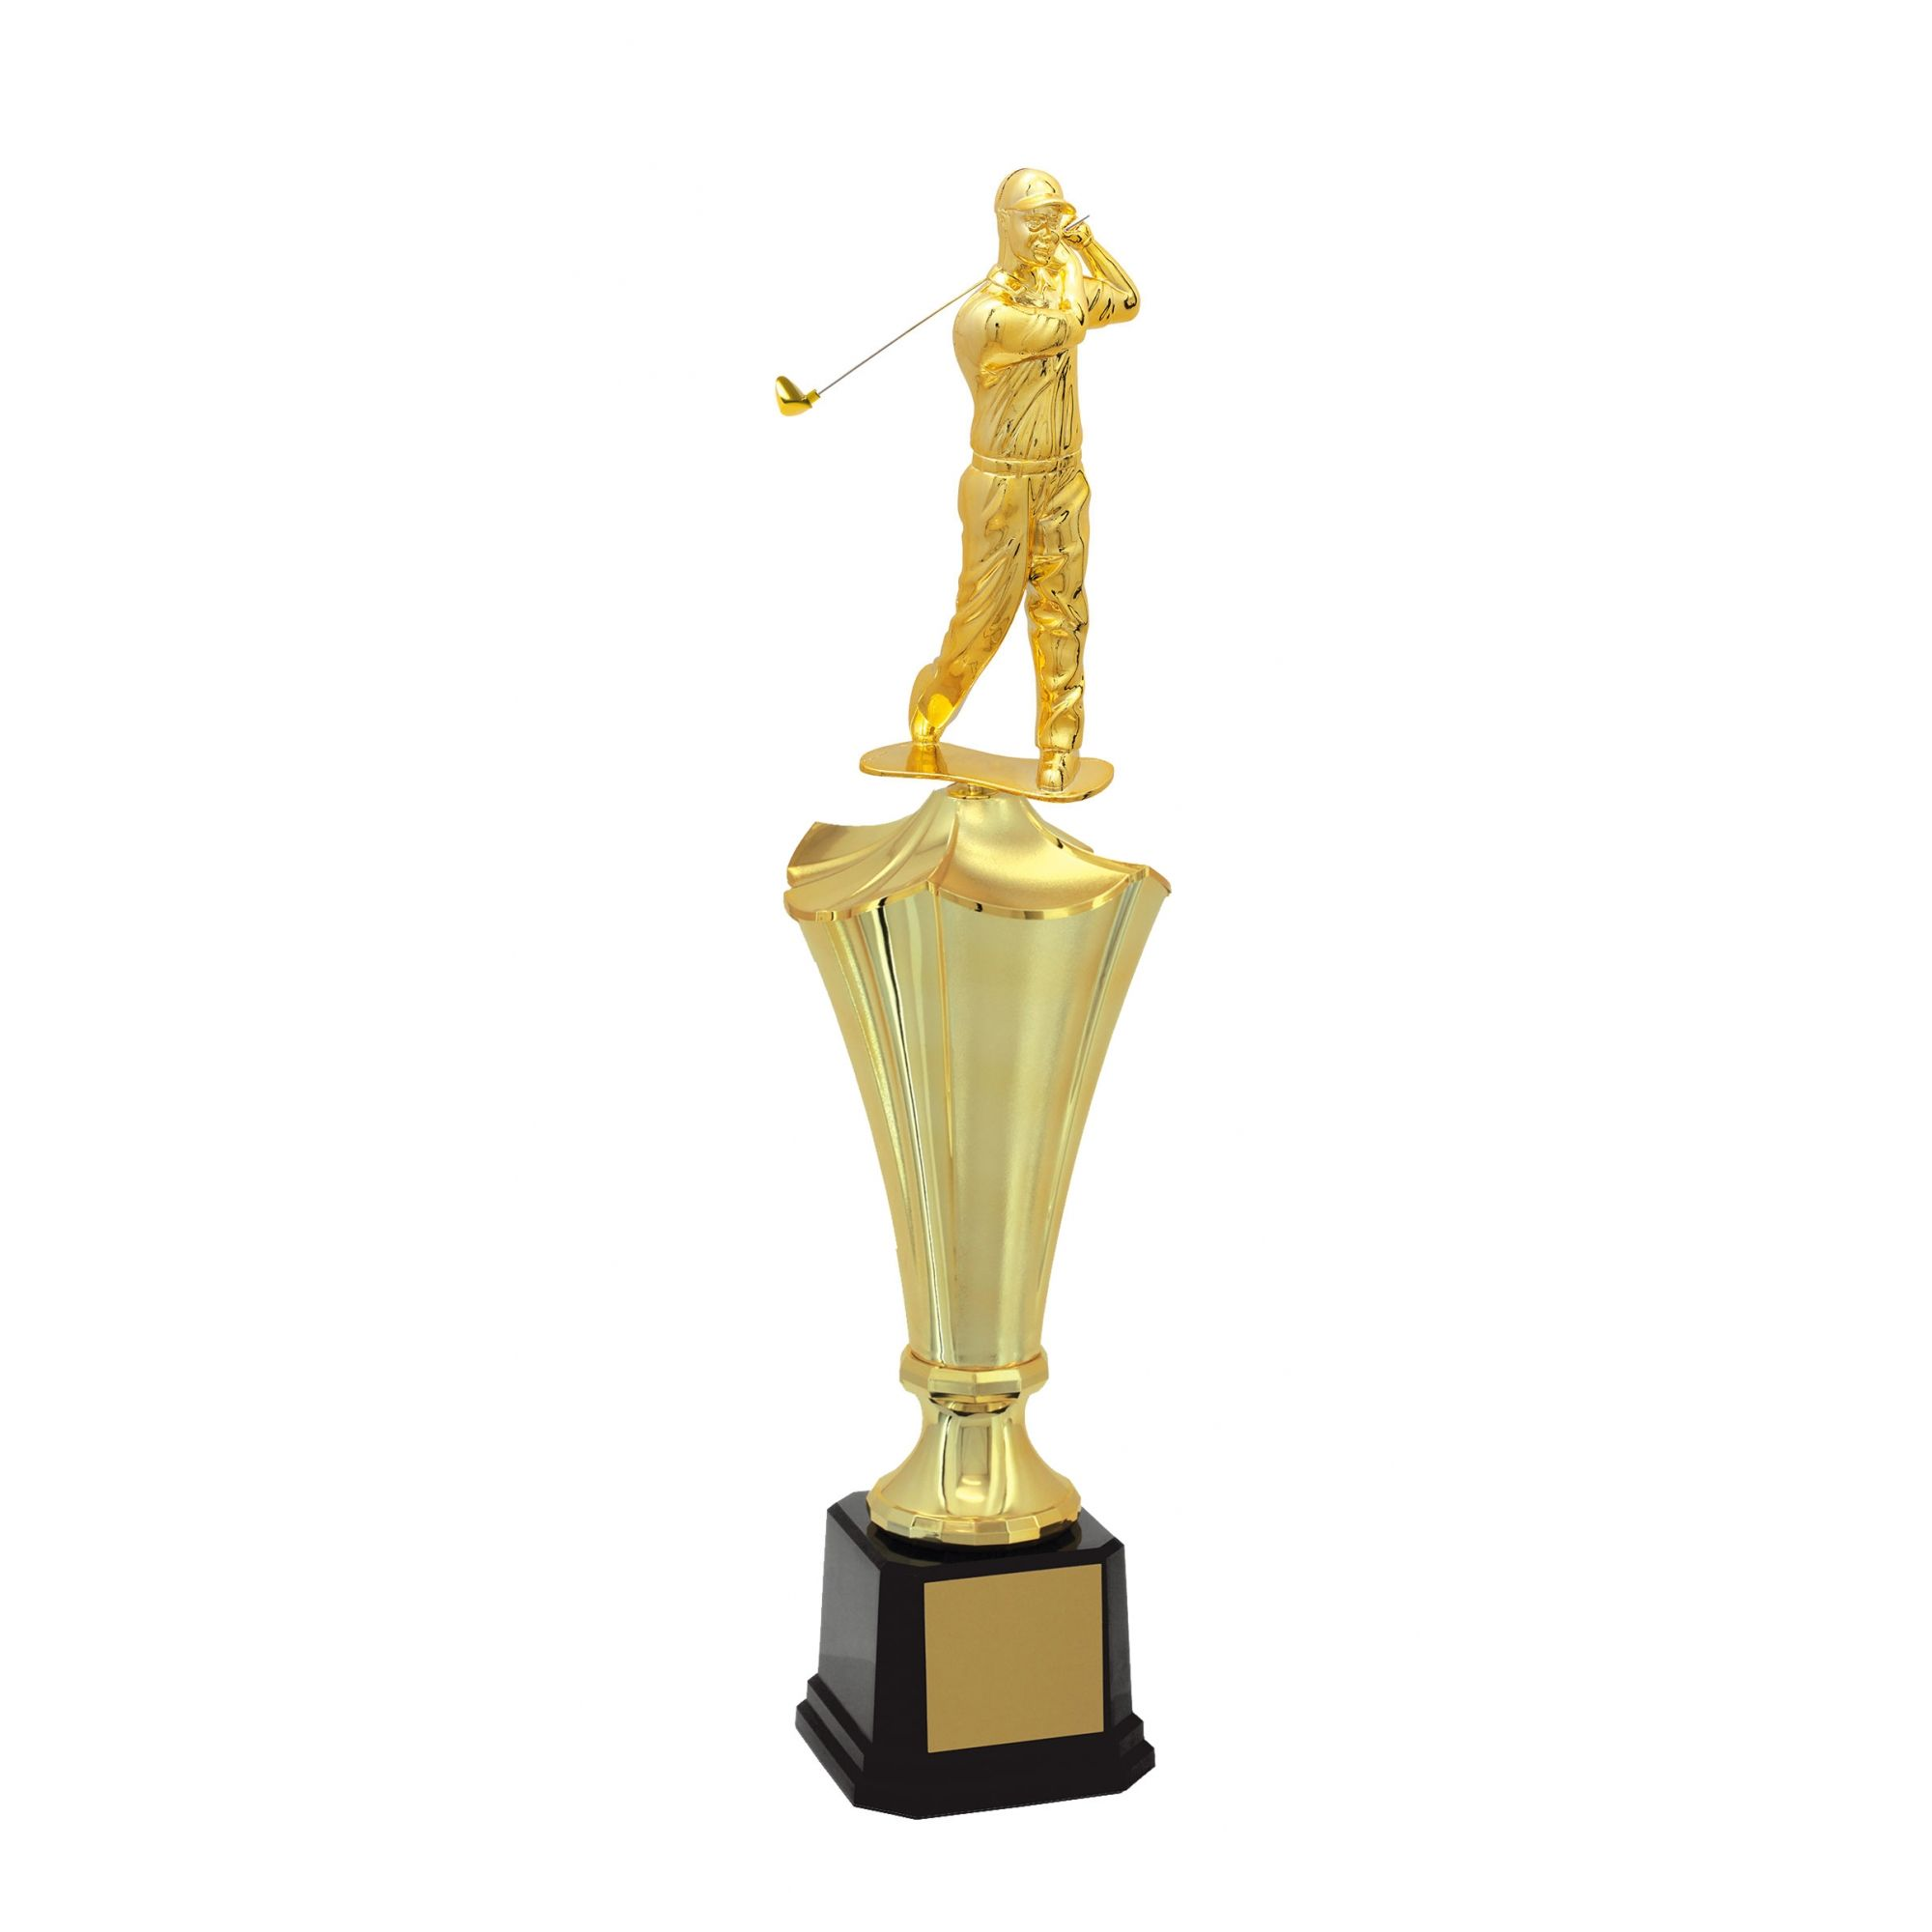 Troféu de Golfe GLF300 <br>75,0 / 67,0 / 58,0cm